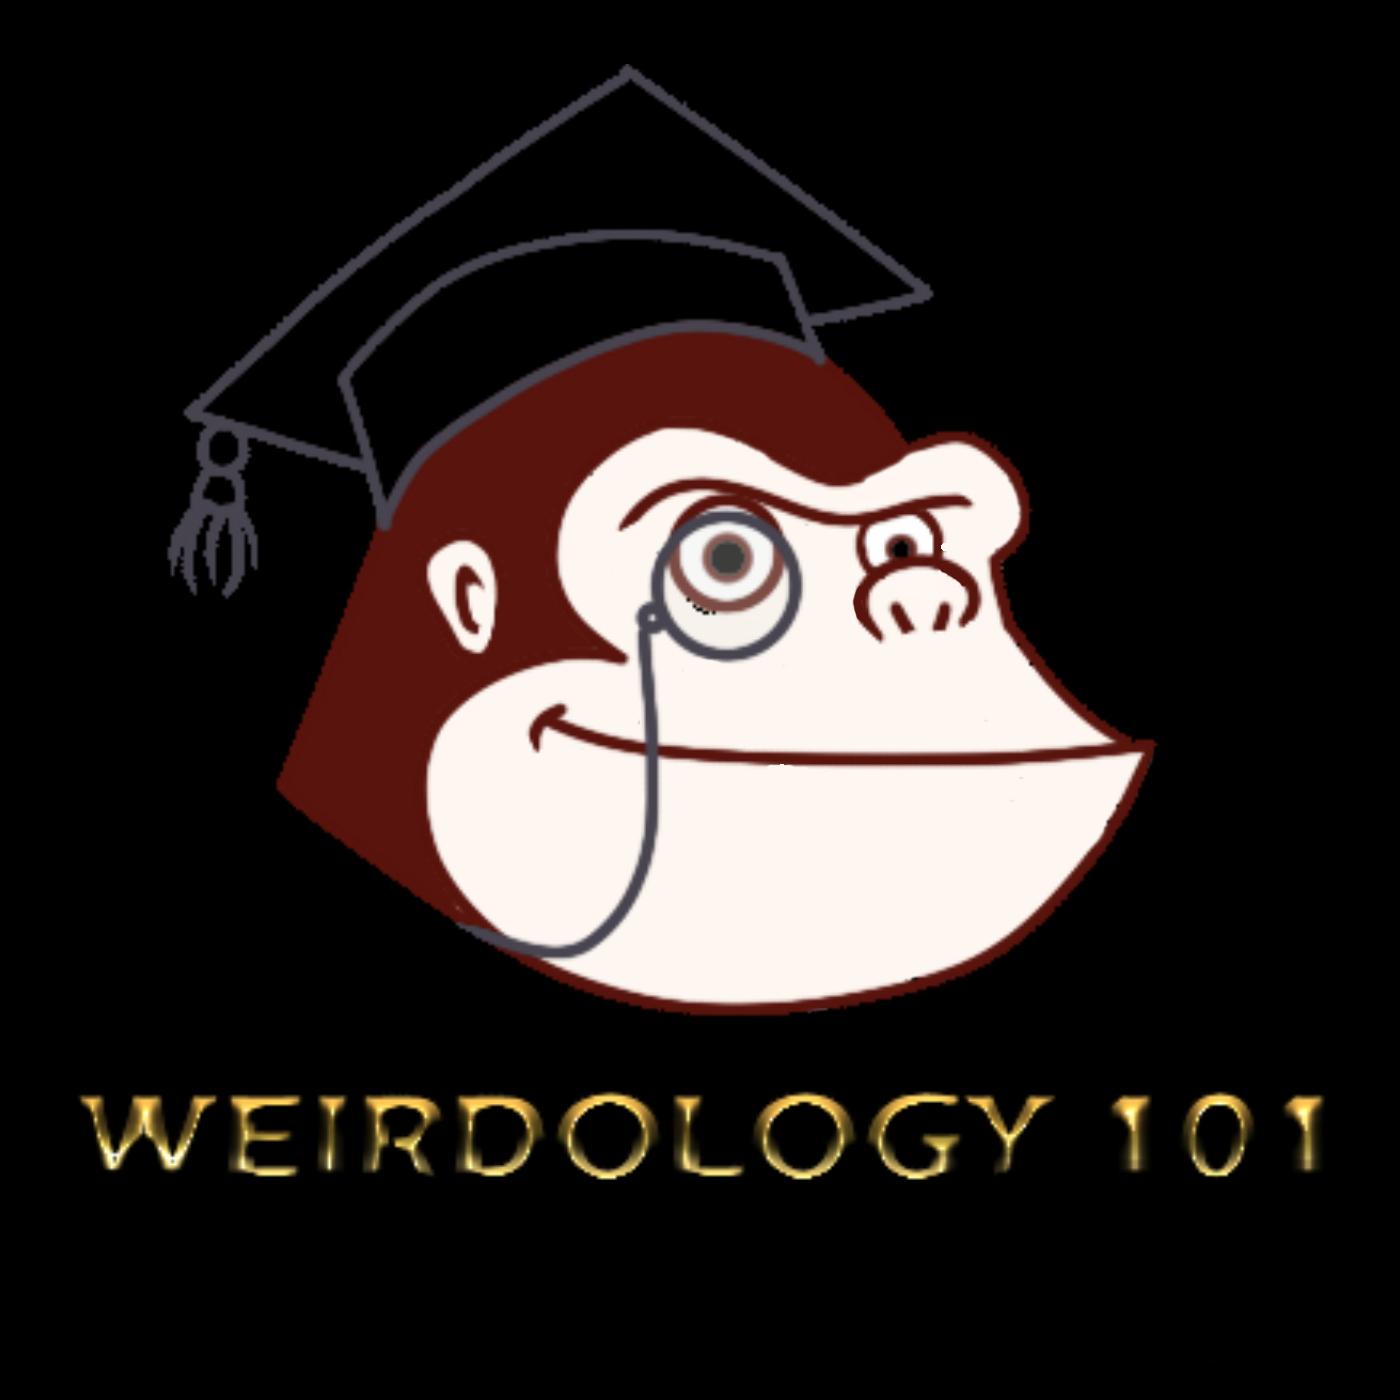 Weirdology101